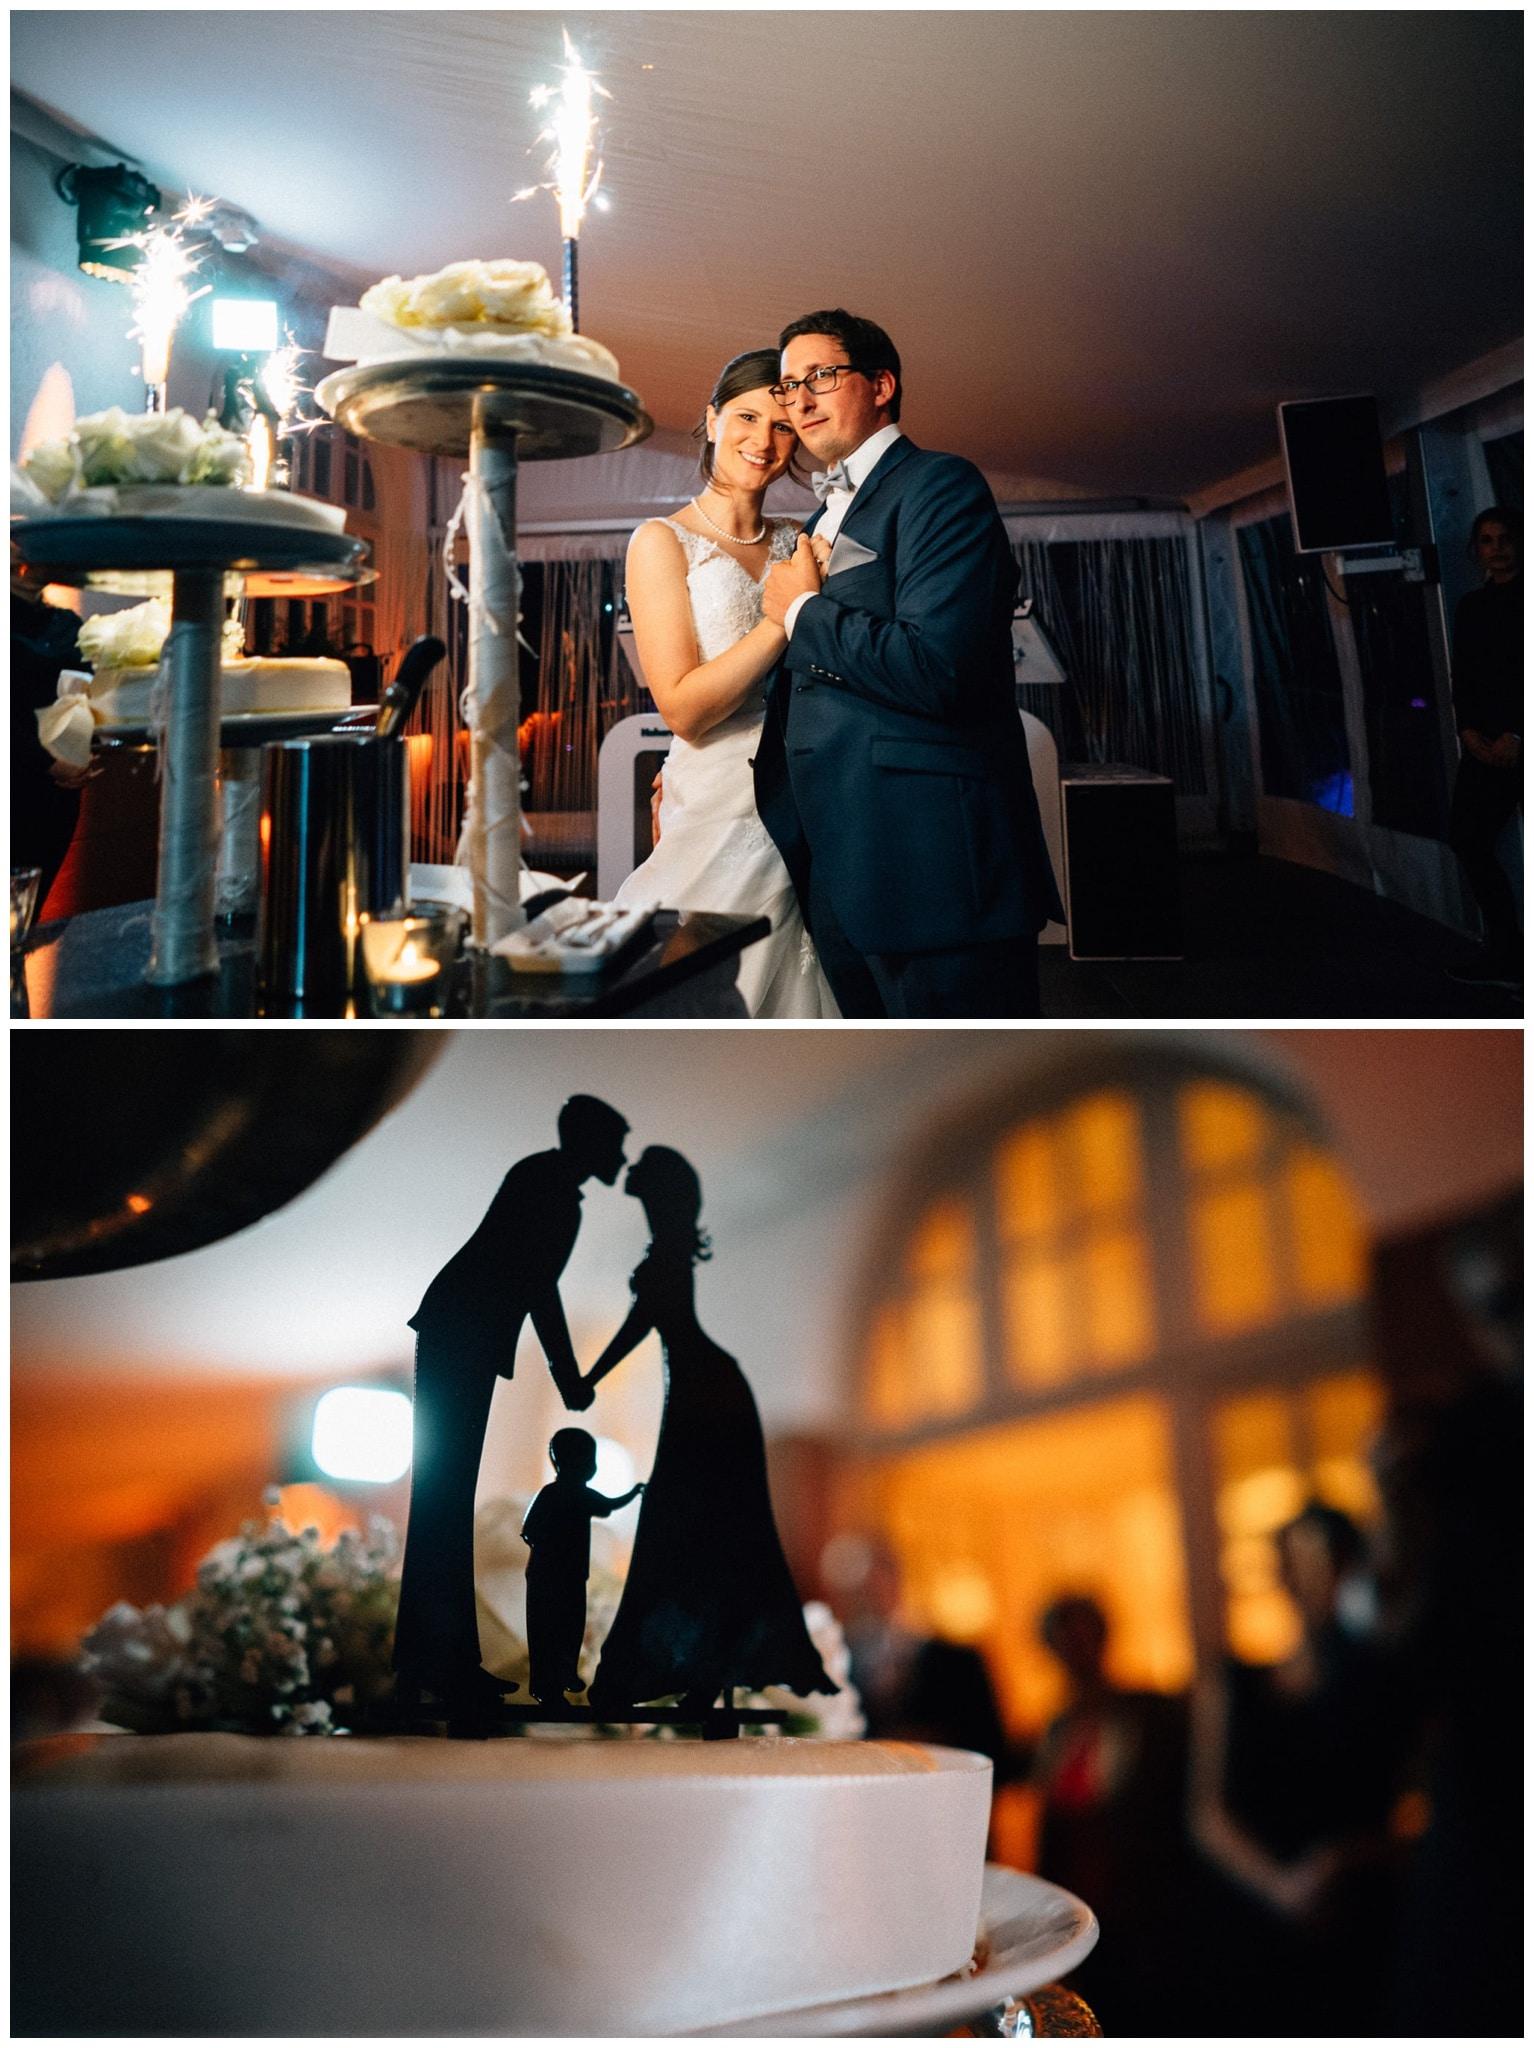 Katharina und Christian Darsberg @mama wedding17 1